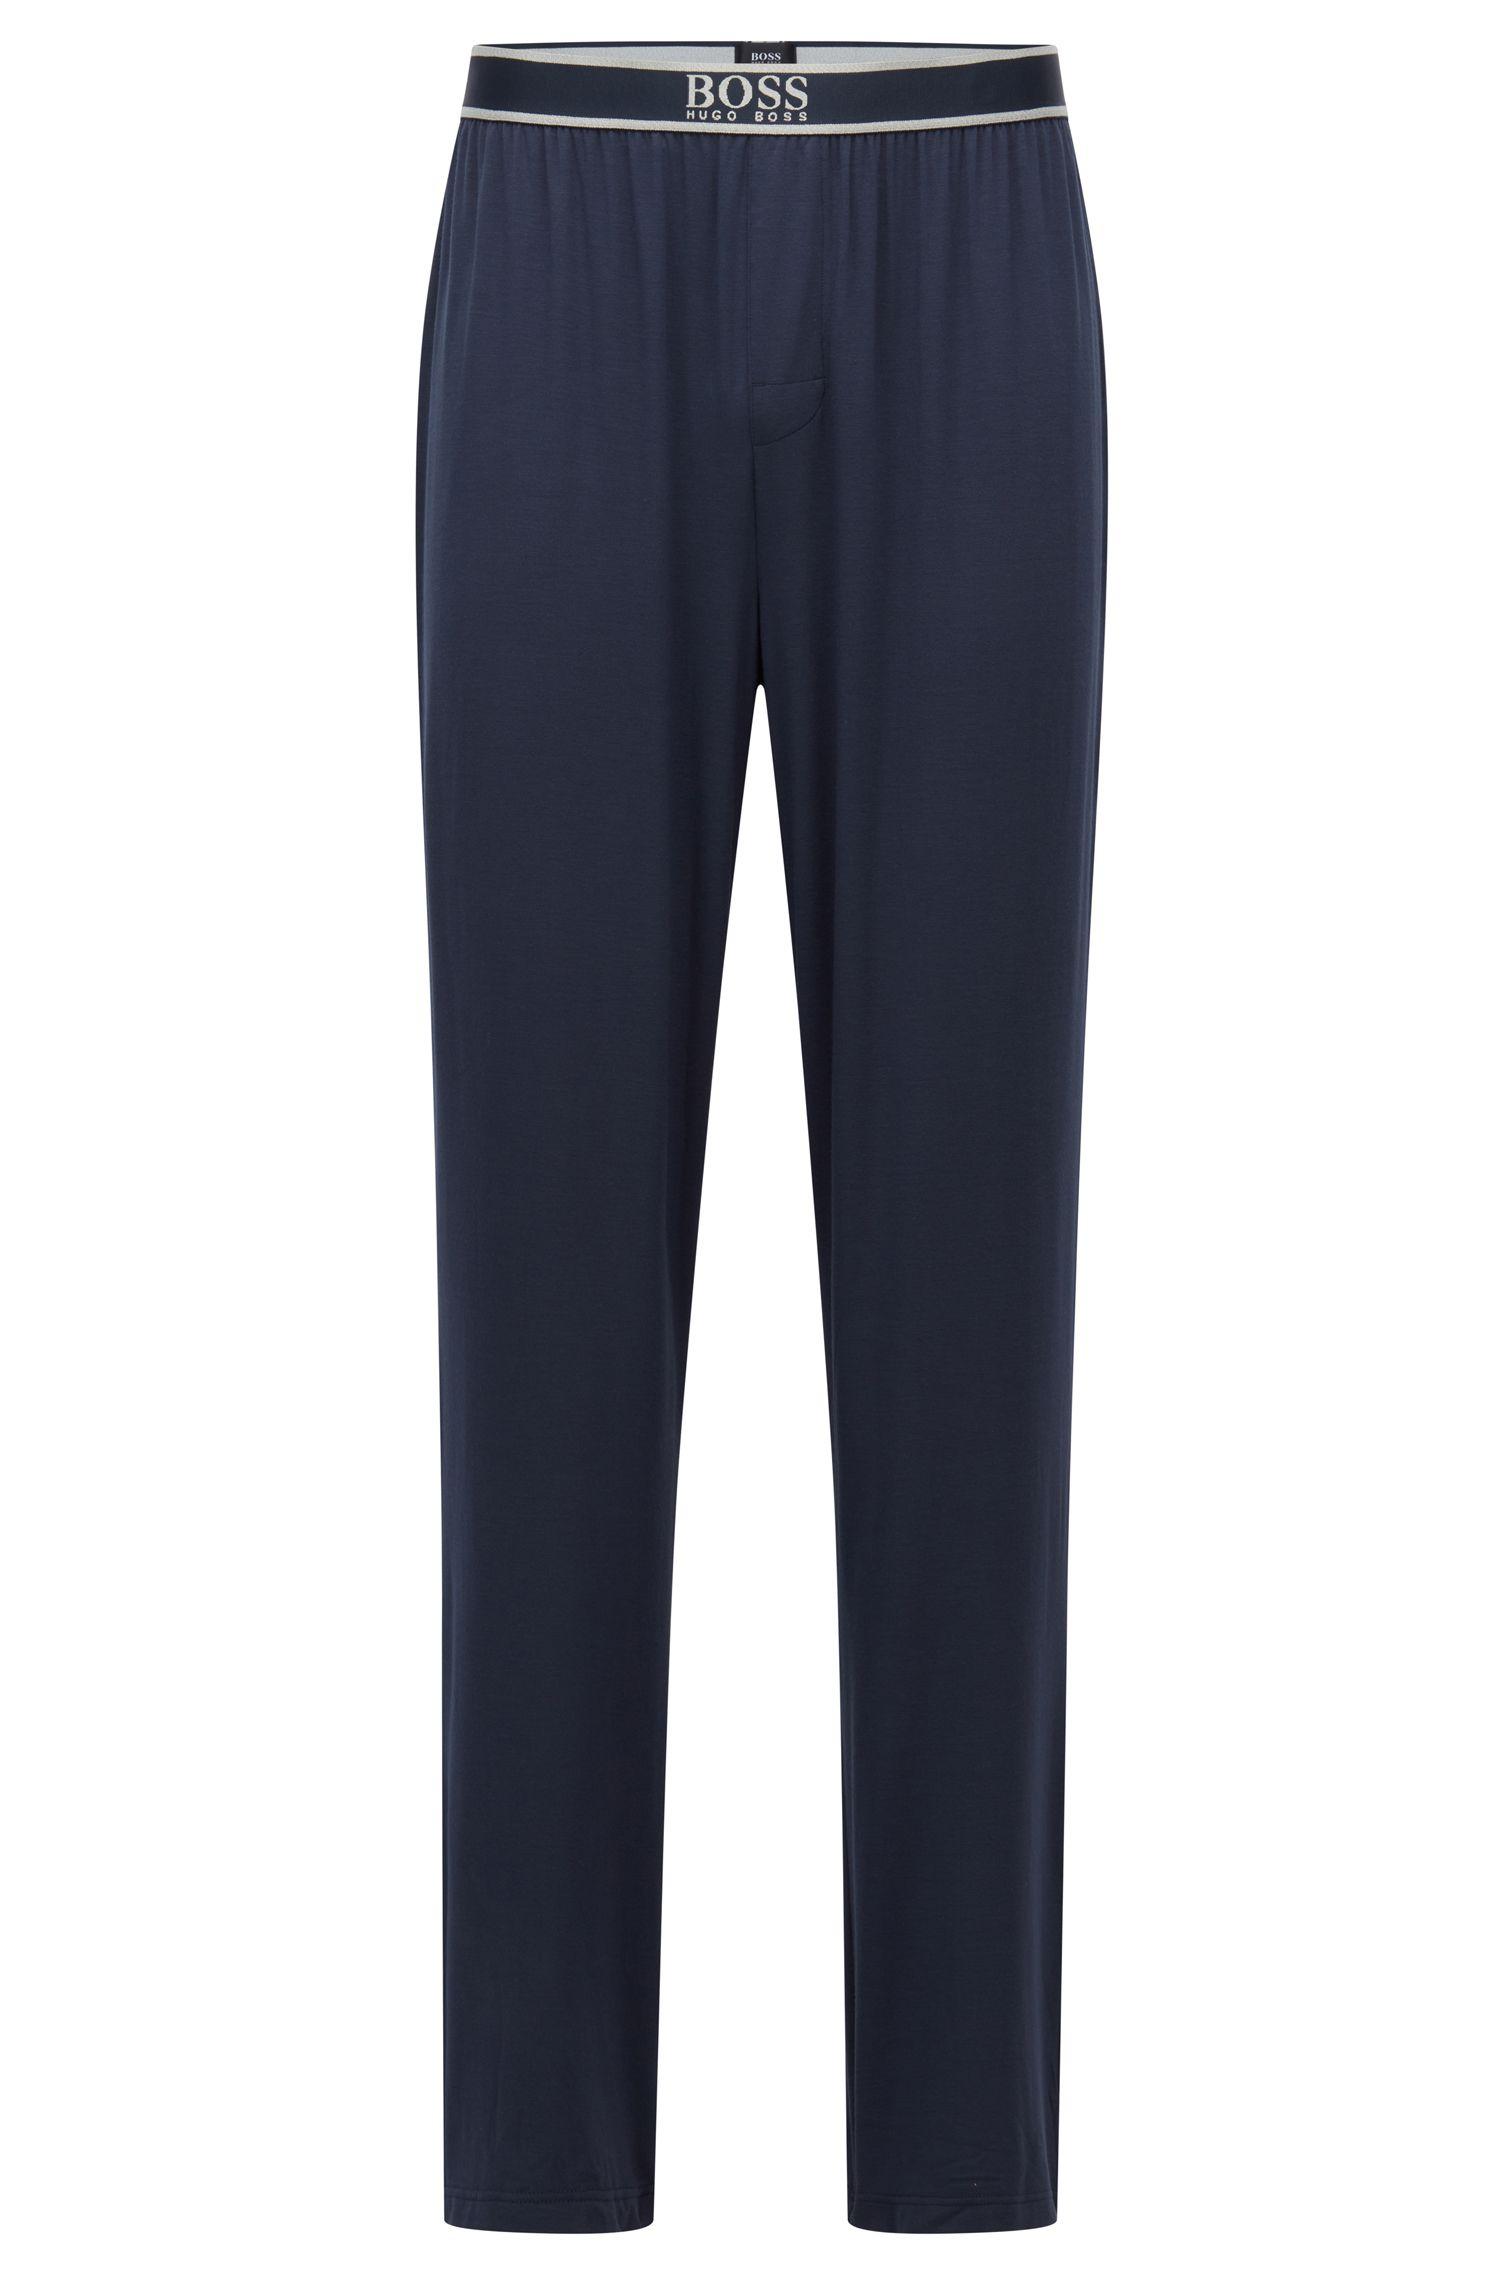 Pyjama-Hose aus Stretch-Modal mit Logo am Bund, Dunkelblau